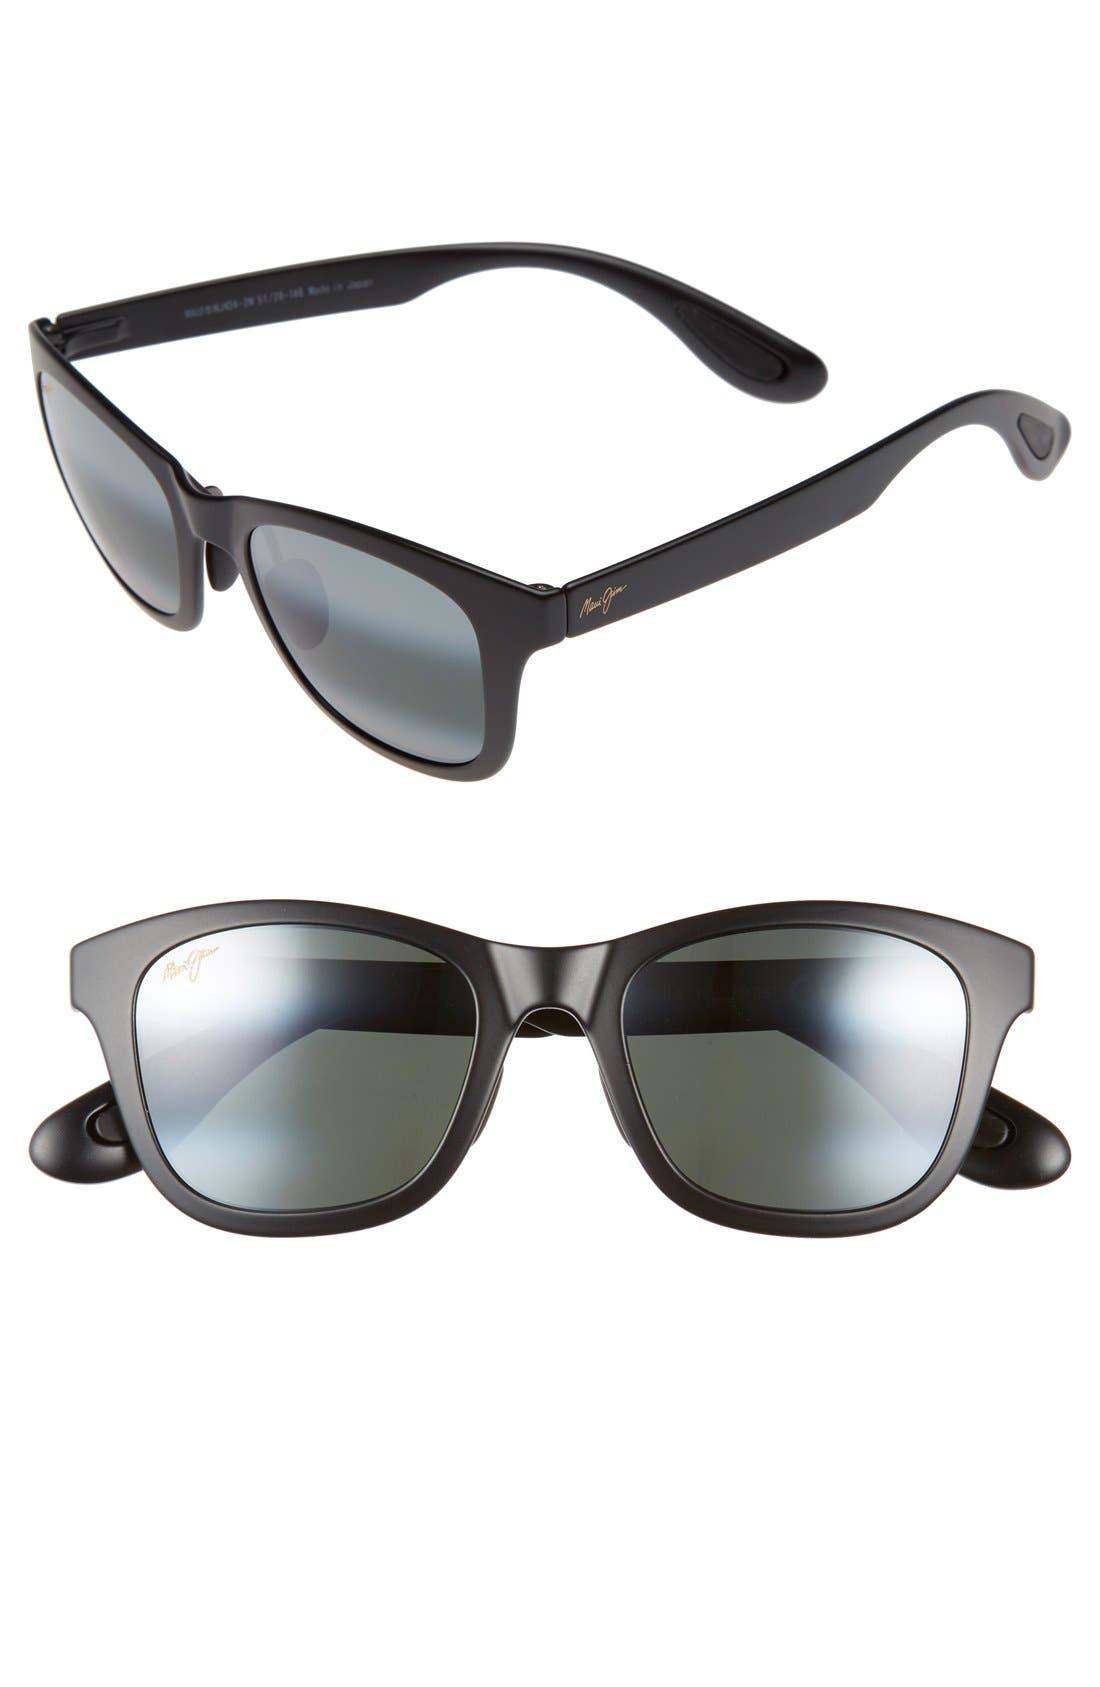 Hana Bay 51mm PolarizedPlus2<sup>®</sup> Sunglasses,                             Main thumbnail 1, color,                             MATTE BLACK/ NEUTRAL GREY